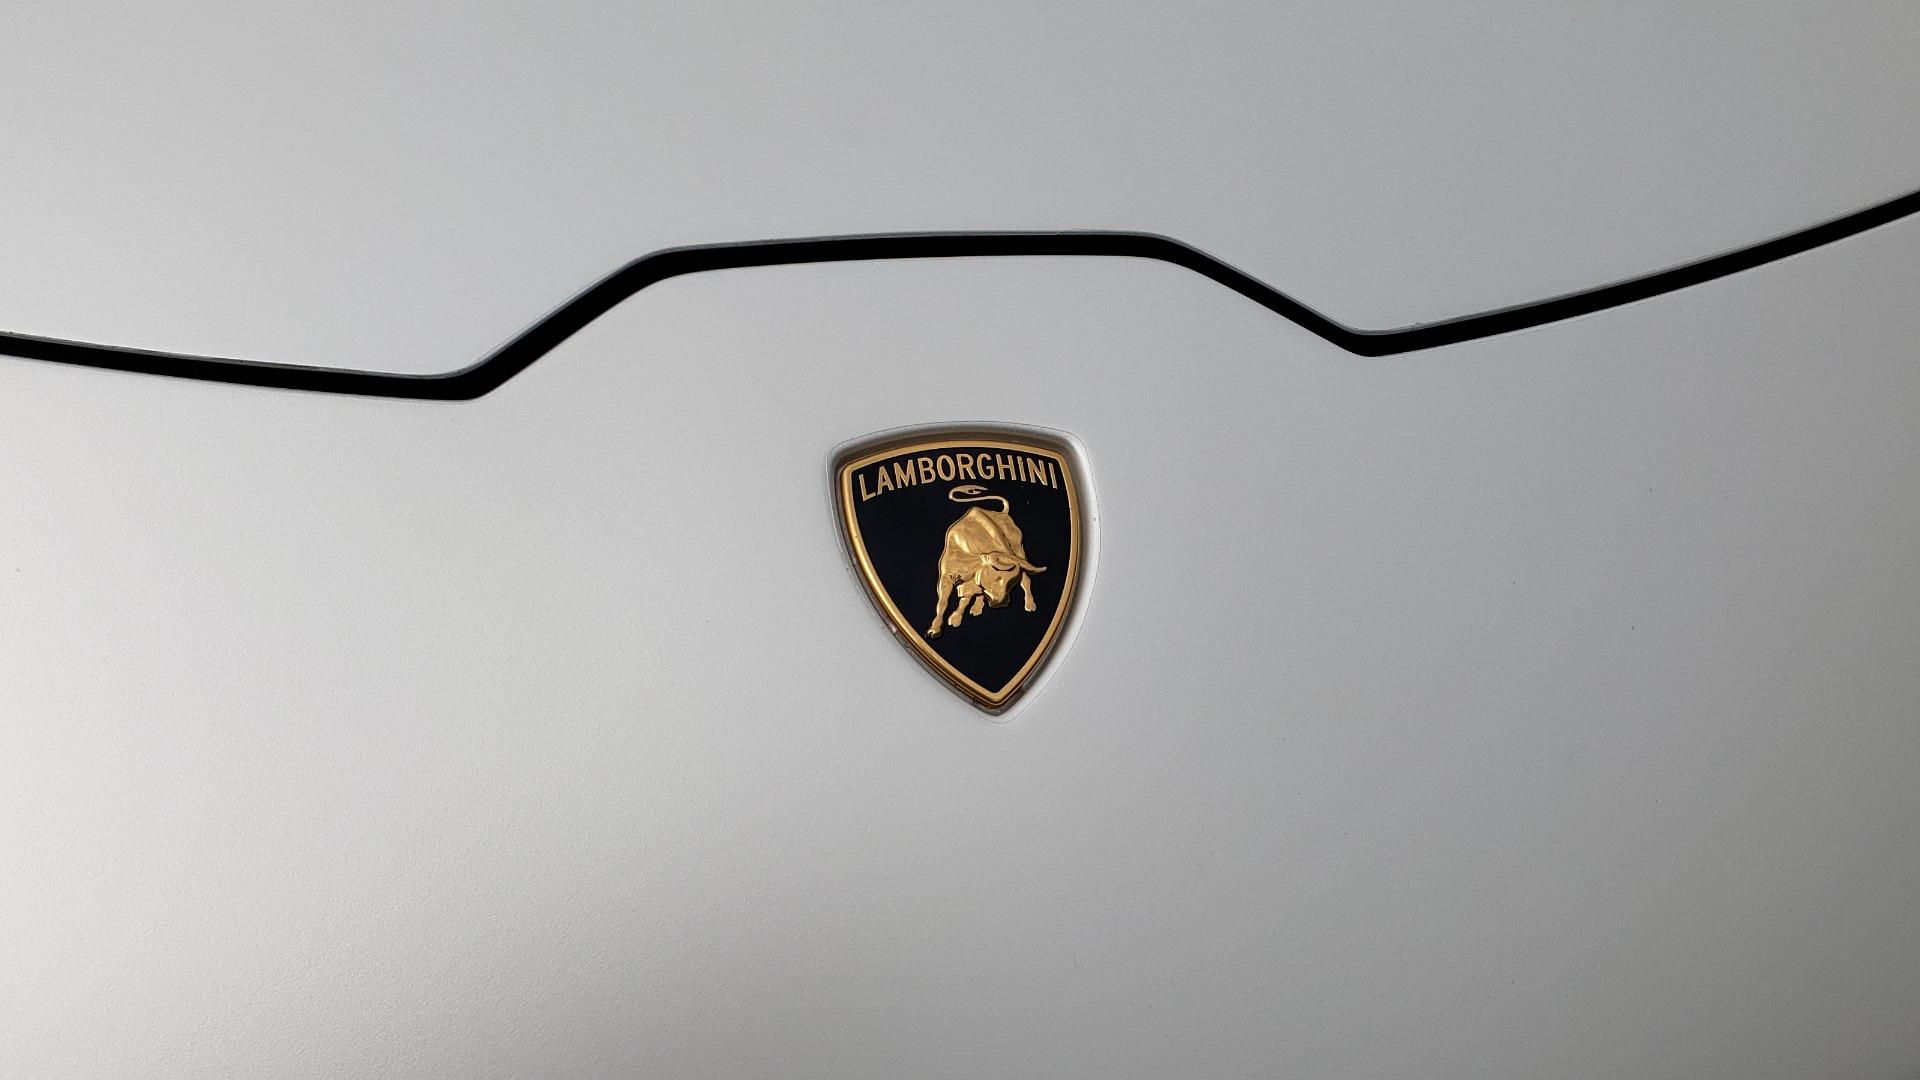 Used 2018 Lamborghini HURACAN PERFORMANTE 5.2L V10 / 630HP / 7-SPD AUTO / AWD / NAV / PREM SND for sale $269,995 at Formula Imports in Charlotte NC 28227 20